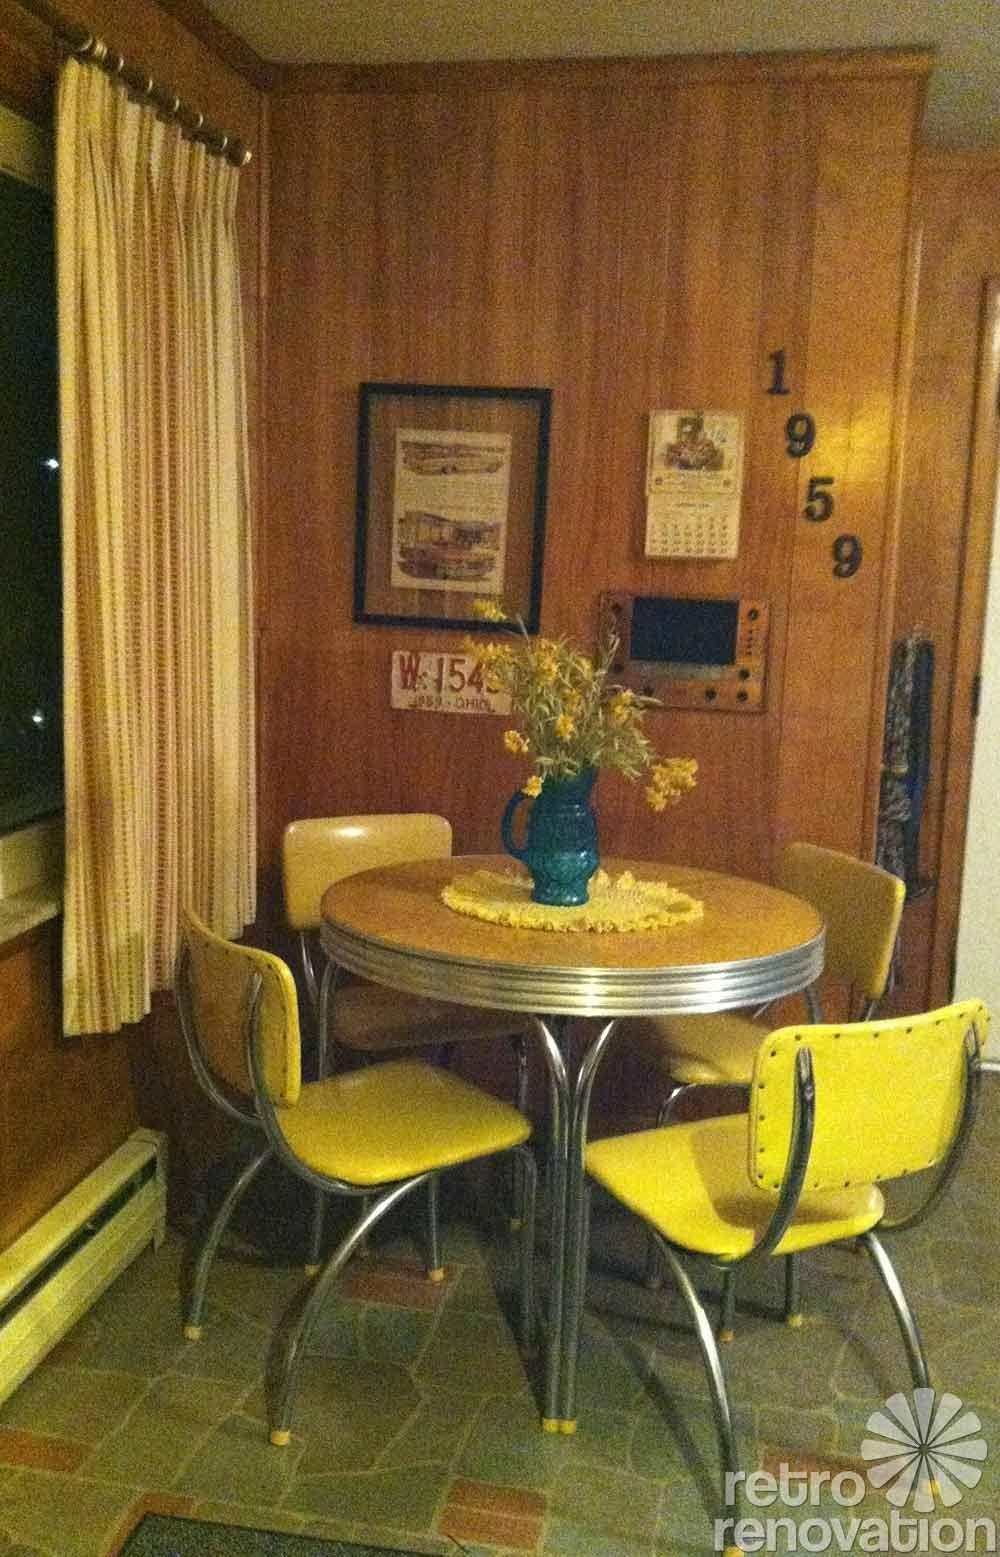 chromcraft chairs vintage chair massage pad kitchen dinette sets - foter